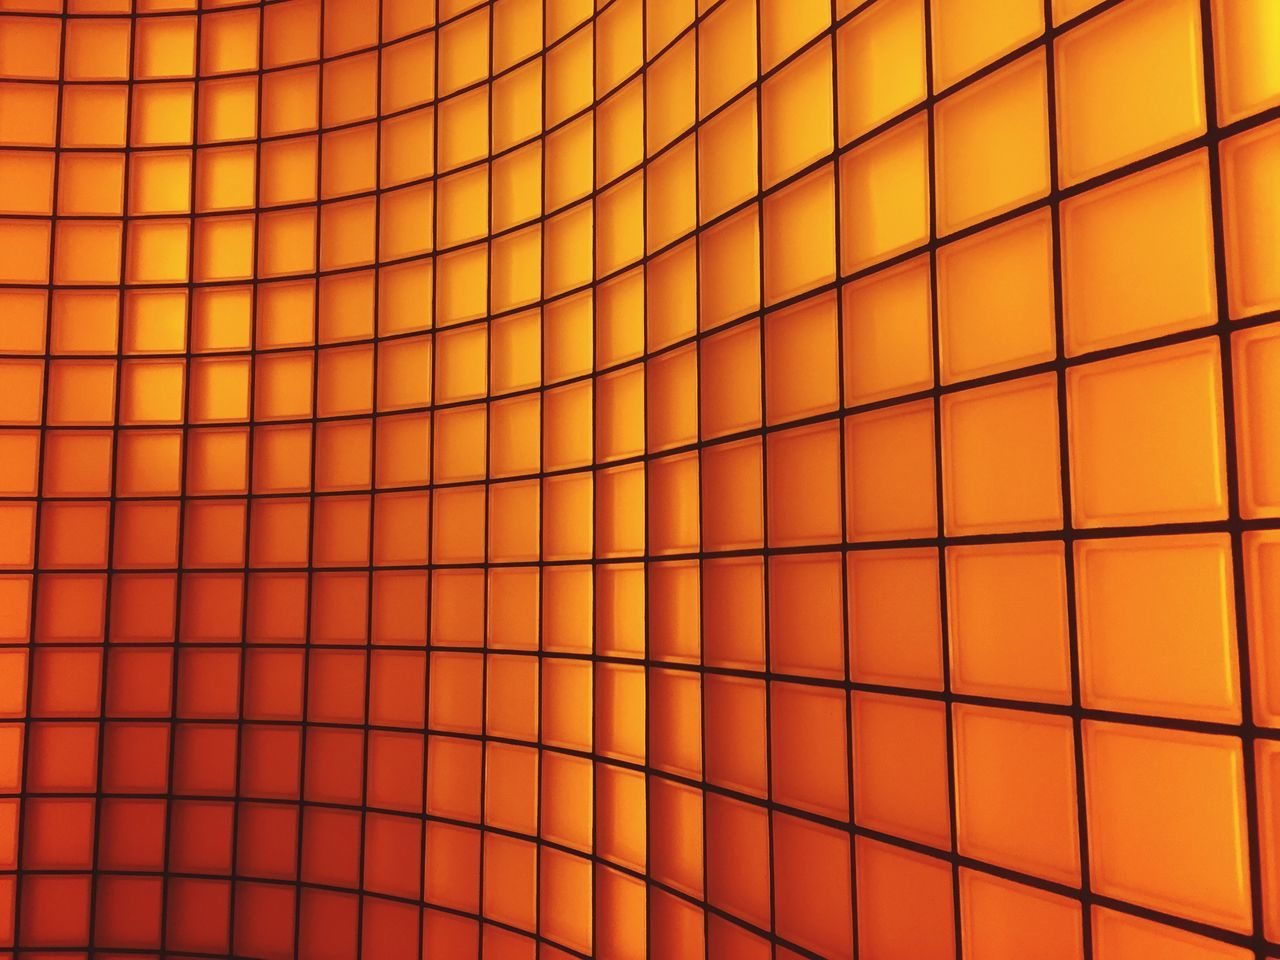 Beautiful stock photos of texture, Amsterdam, Backgrounds, Full Frame, Geometric Shape